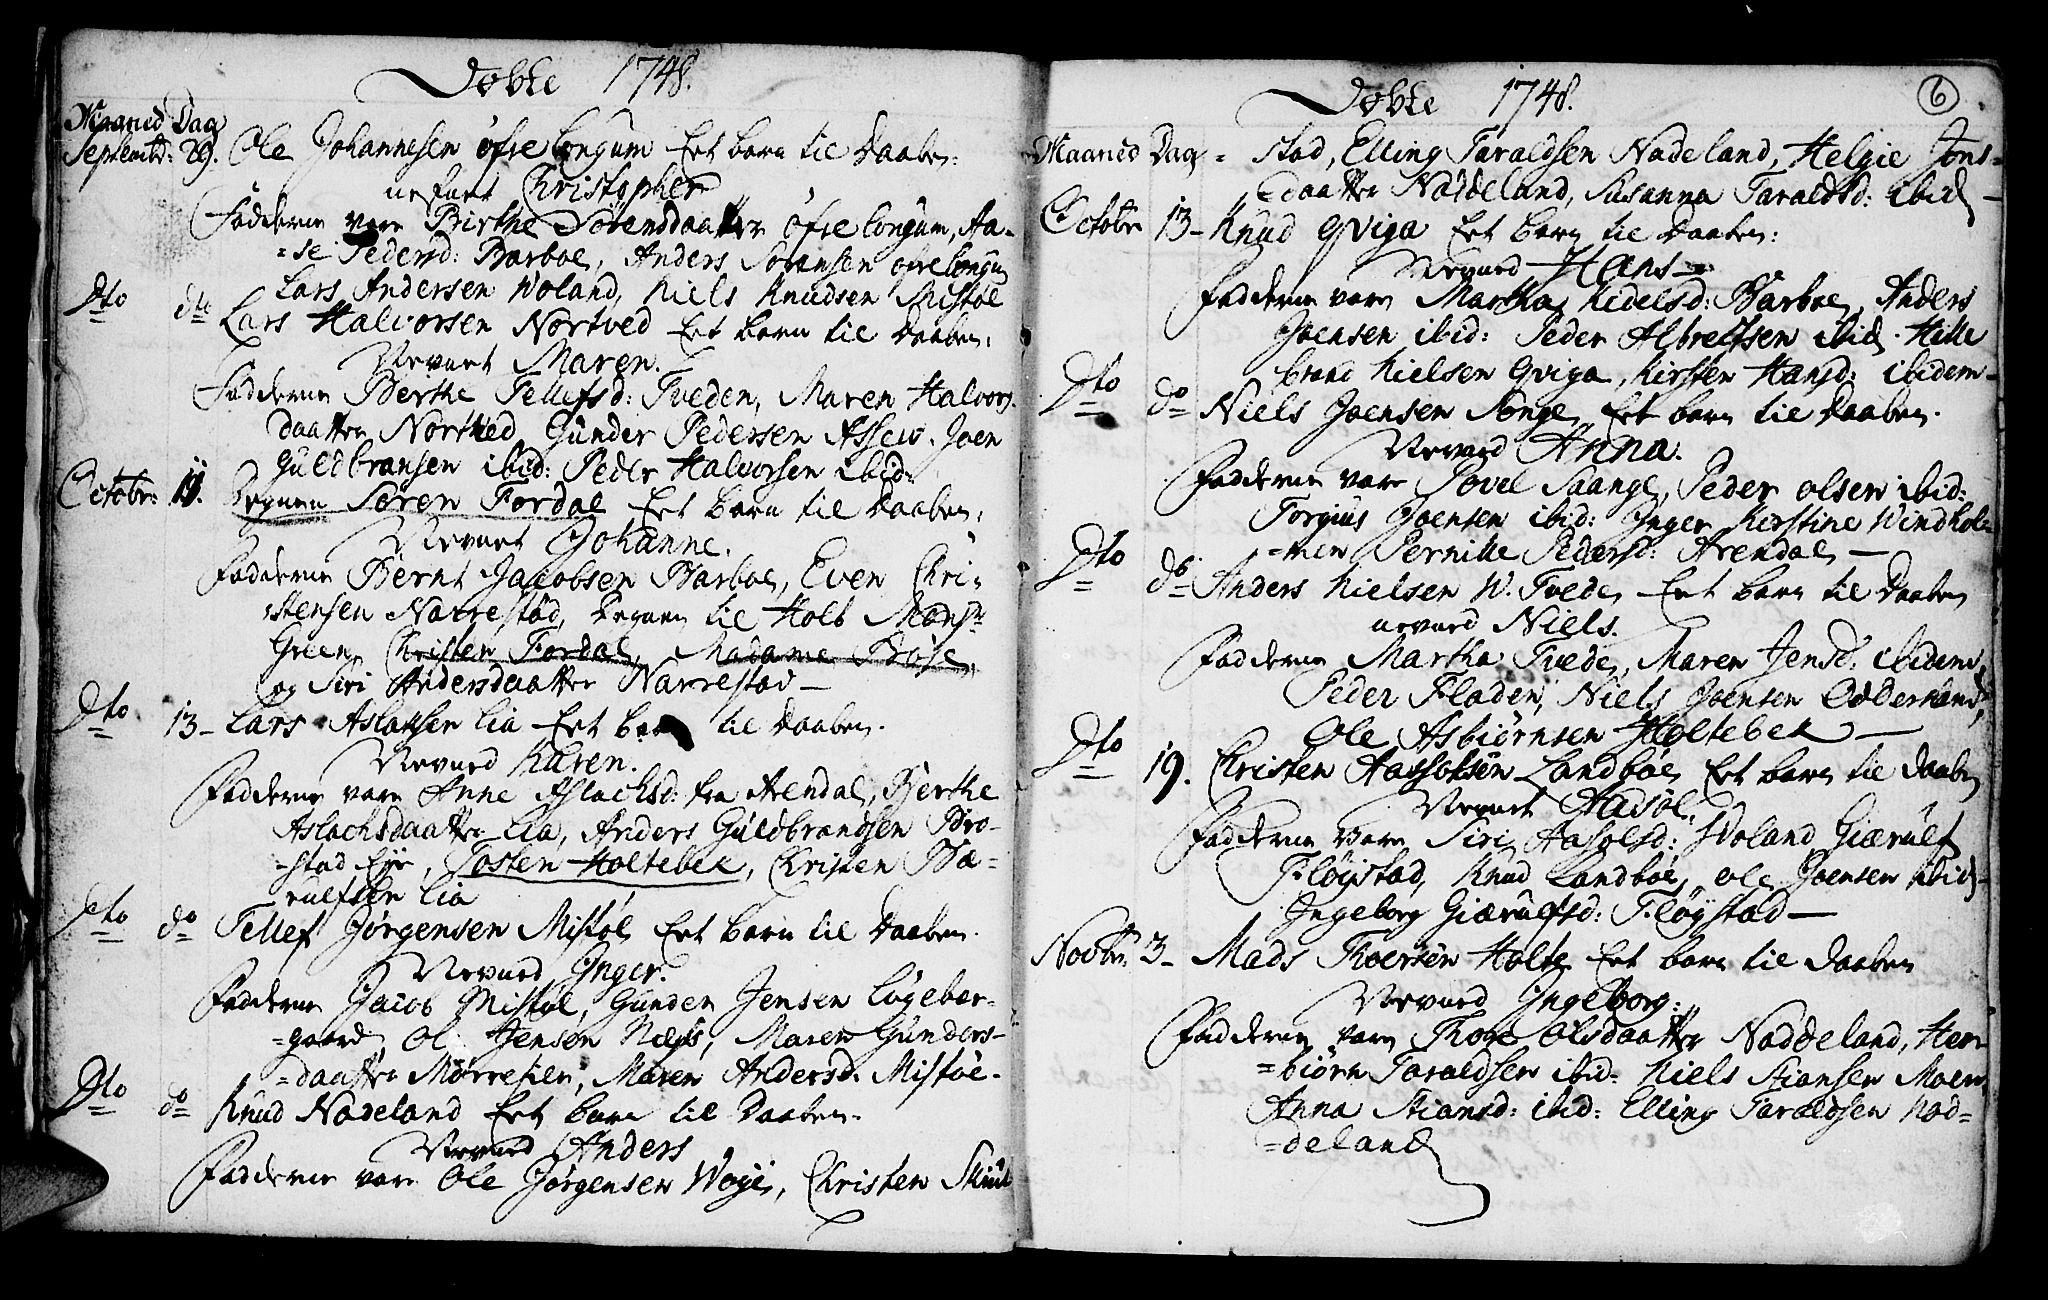 SAK, Austre Moland sokneprestkontor, F/Fa/Faa/L0001: Ministerialbok nr. A 1, 1747-1764, s. 6